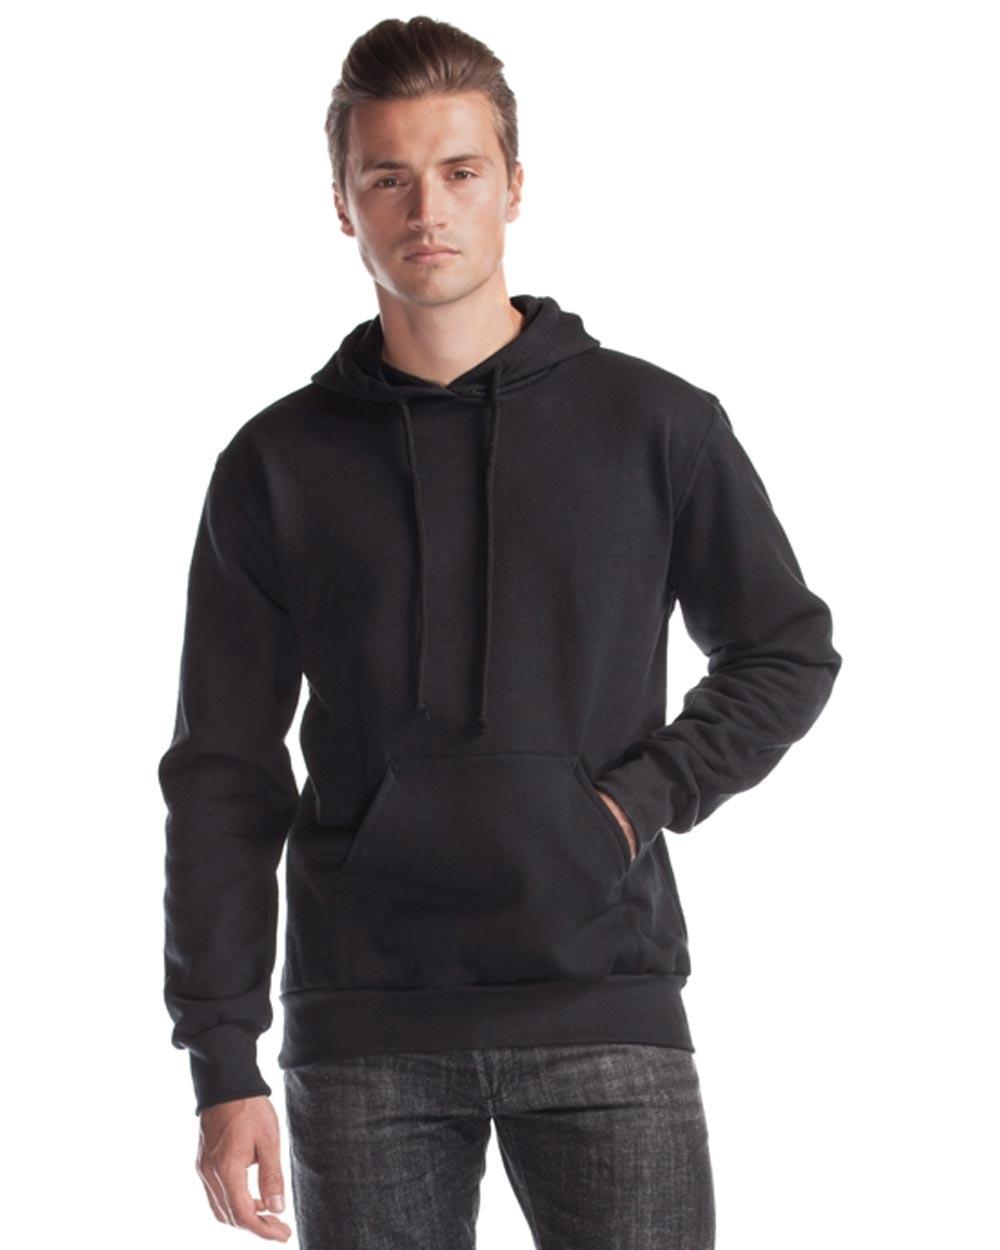 Jerico Ultra Cotton Hooded Sweatshirt